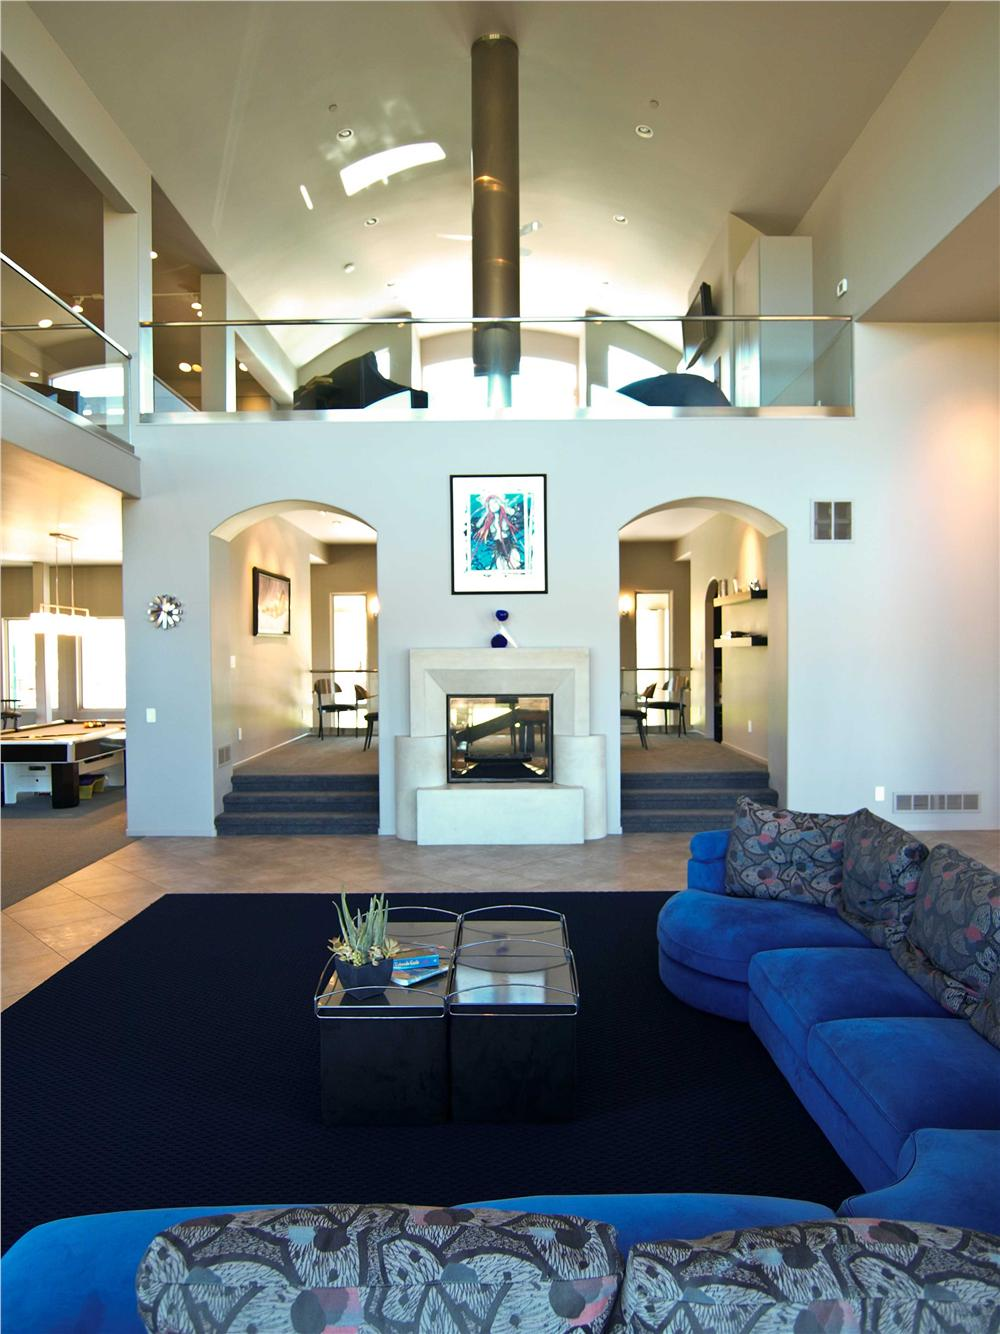 Lovely built-in room divider in open floor plan